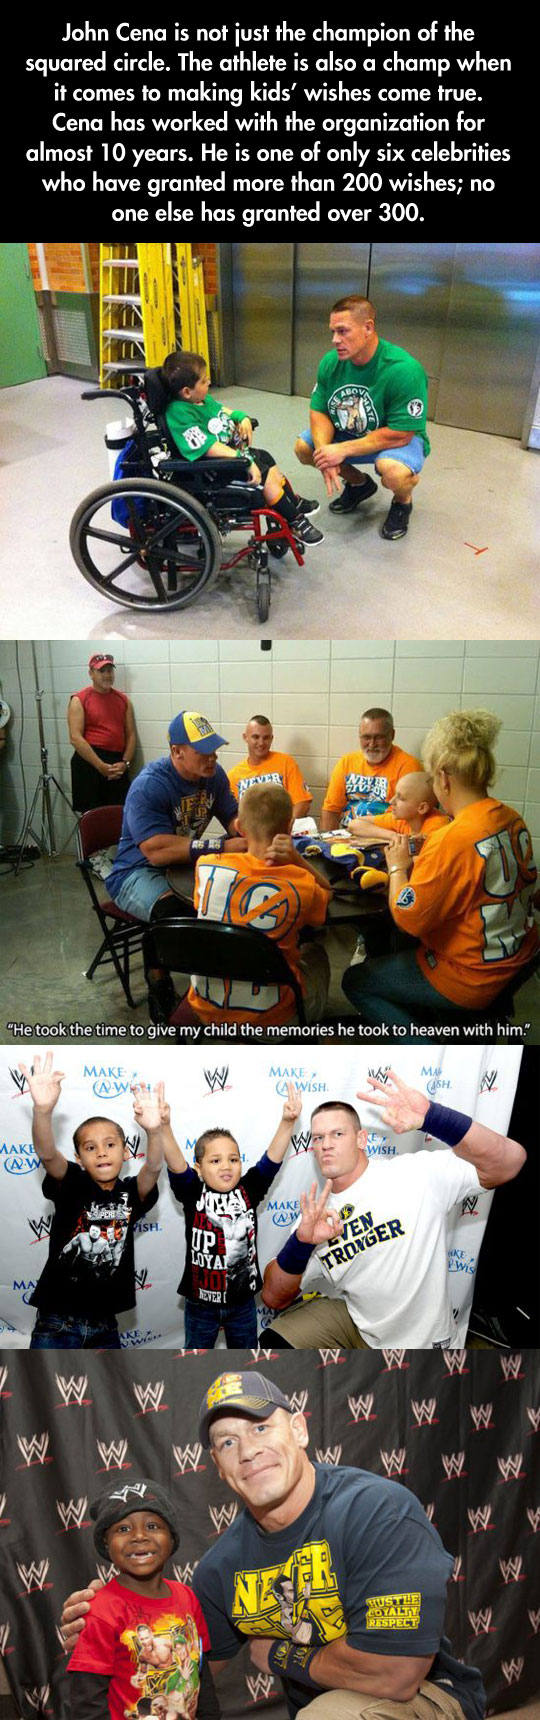 cool-John-Cena-Make-A-Wish-kids